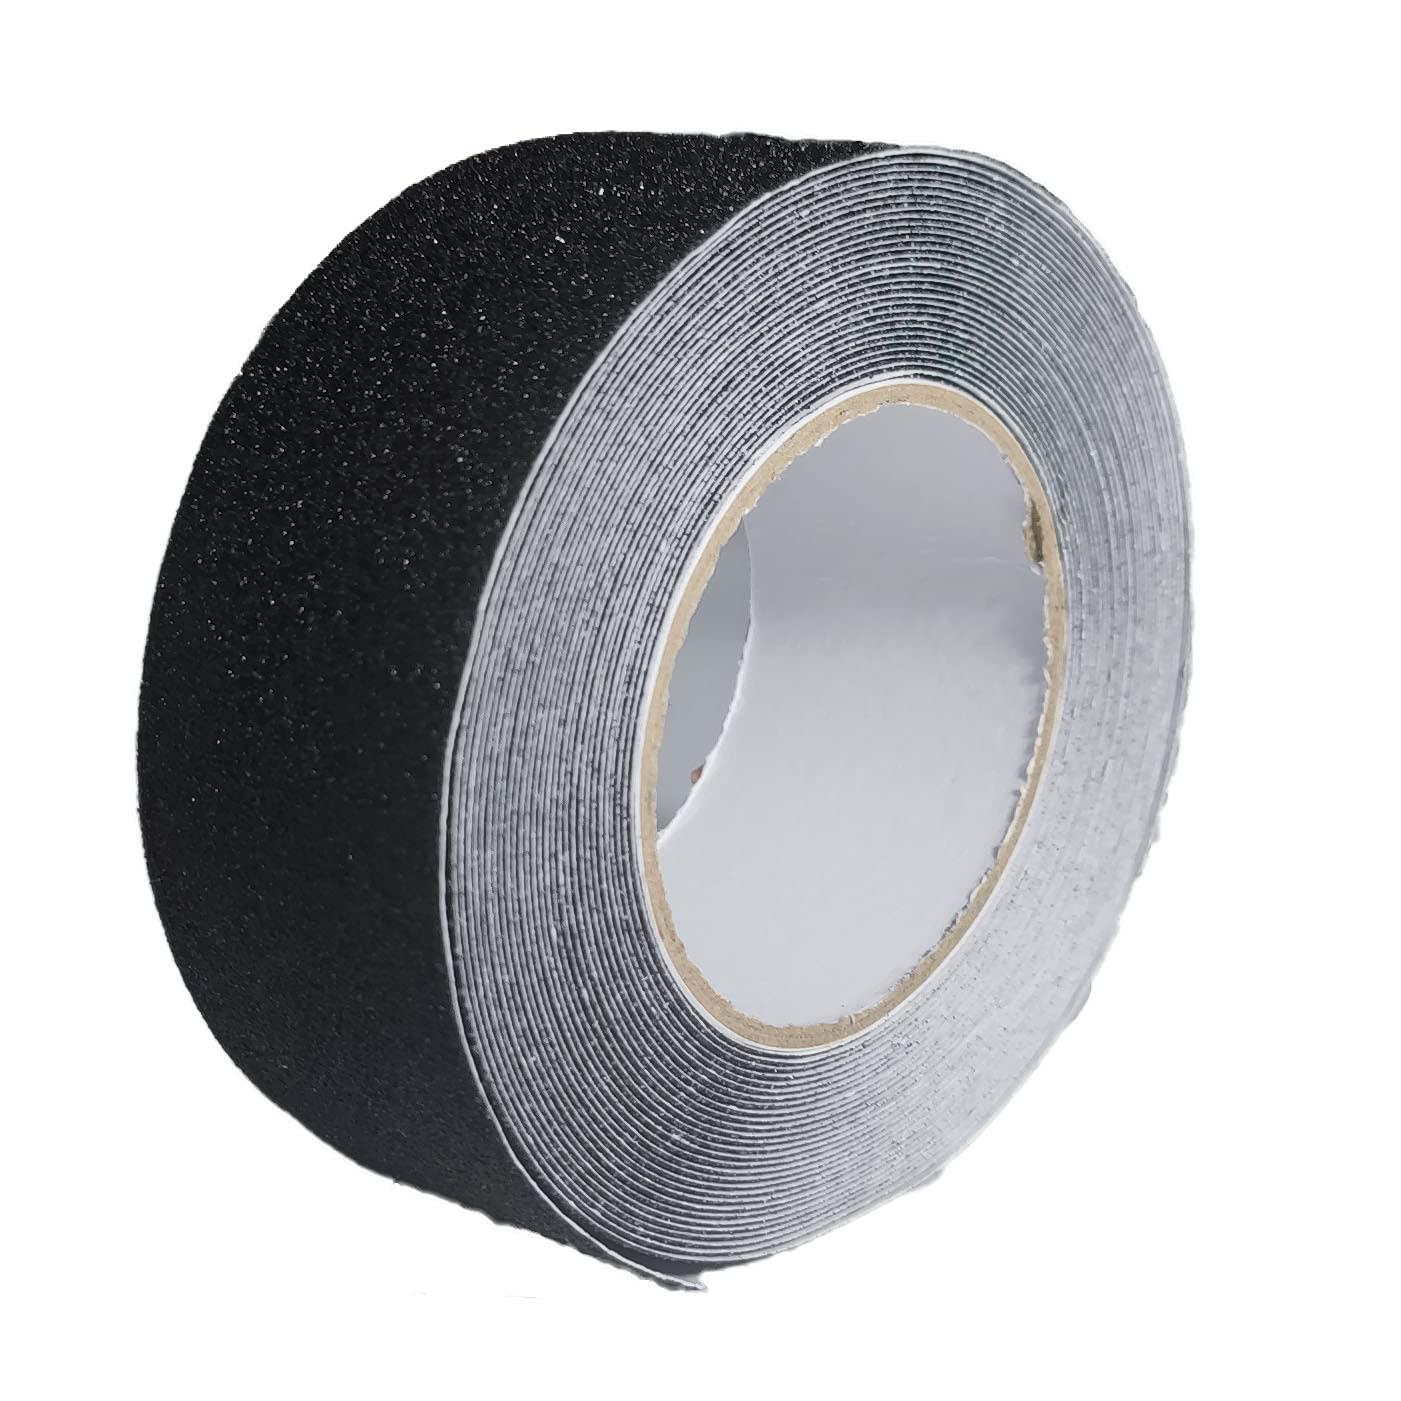 Heavy Duty Max 62% OFF Anti Slip Bargain sale Tape Stair Non Grip Waterproof T